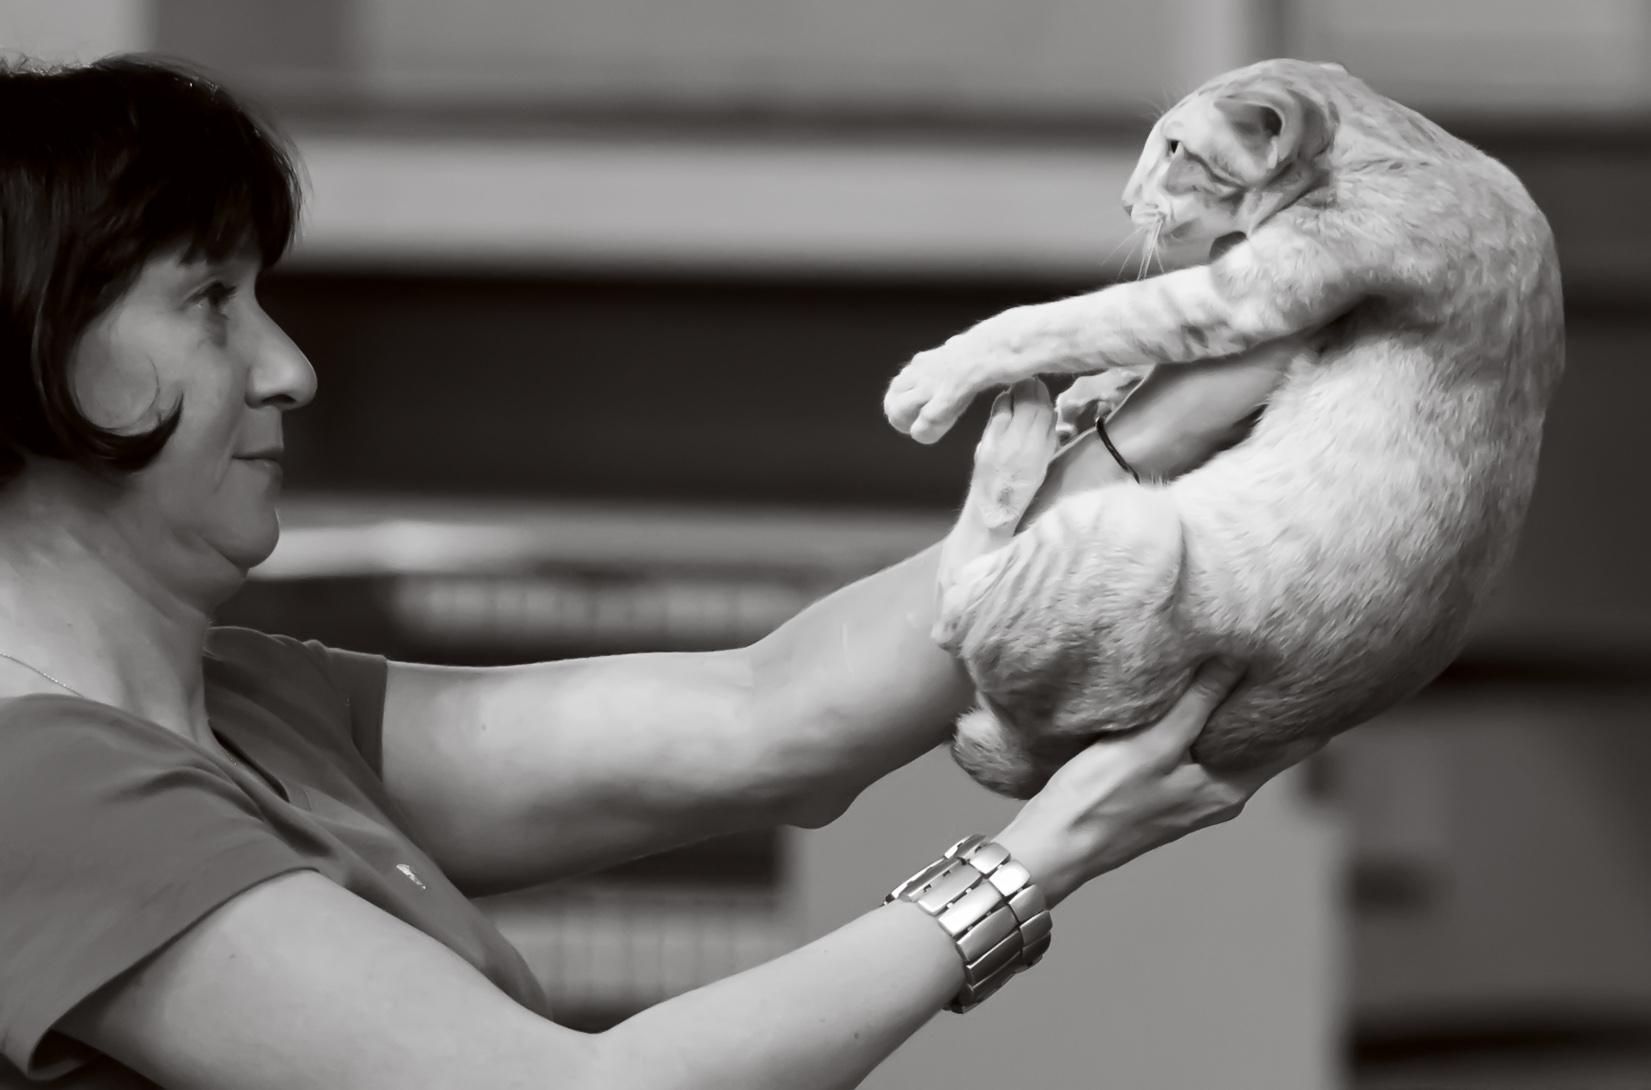 HU*Shagio-Chen Legolas for Keskimaan (Lee) [OSH d 24], photo 211225, 2013-08-24